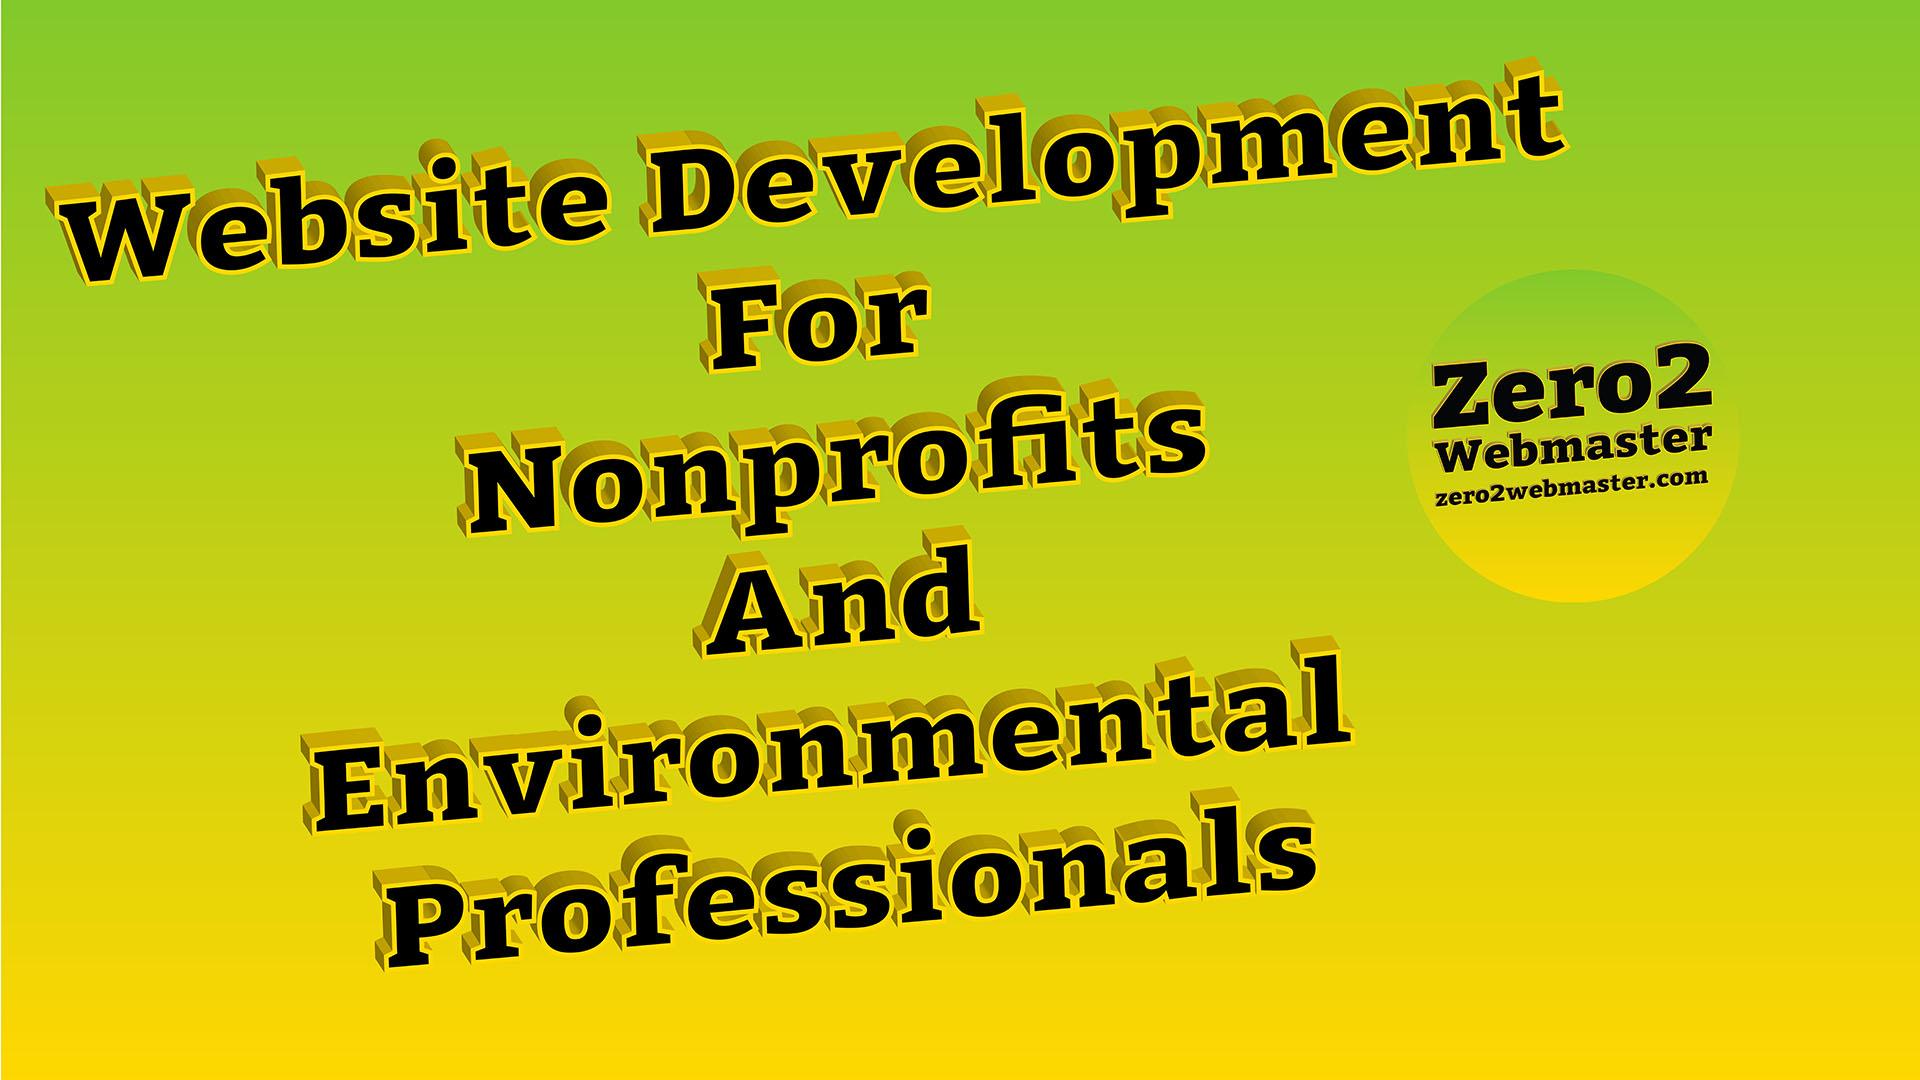 Website Development Nonprofits